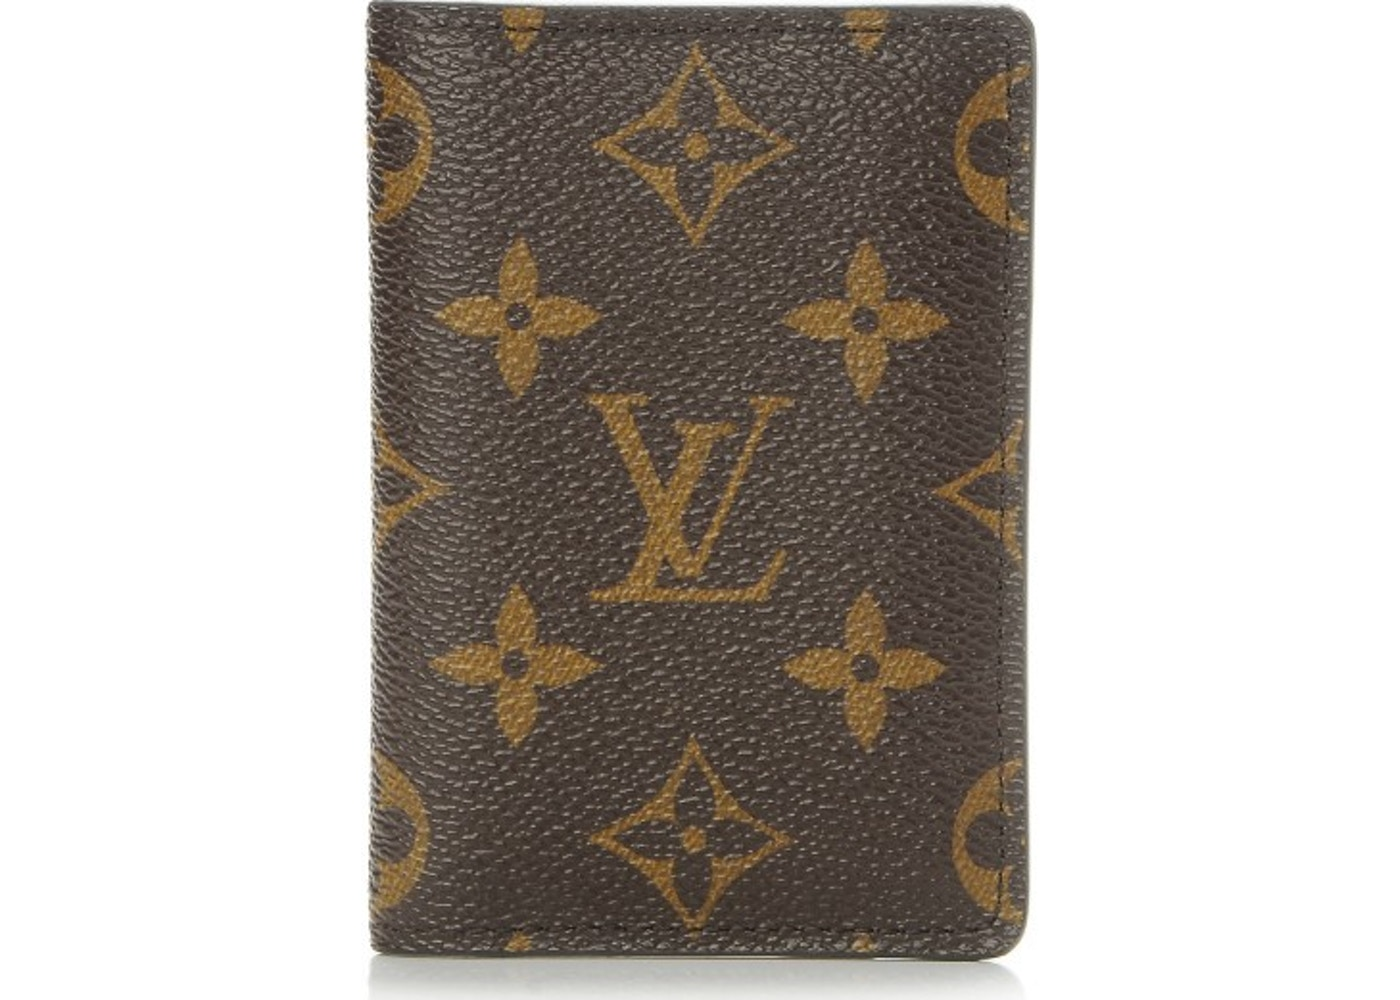 749dedbfa3cd Louis Vuitton Card Holder Pocket Organizer Monogram Brown. Monogram Brown